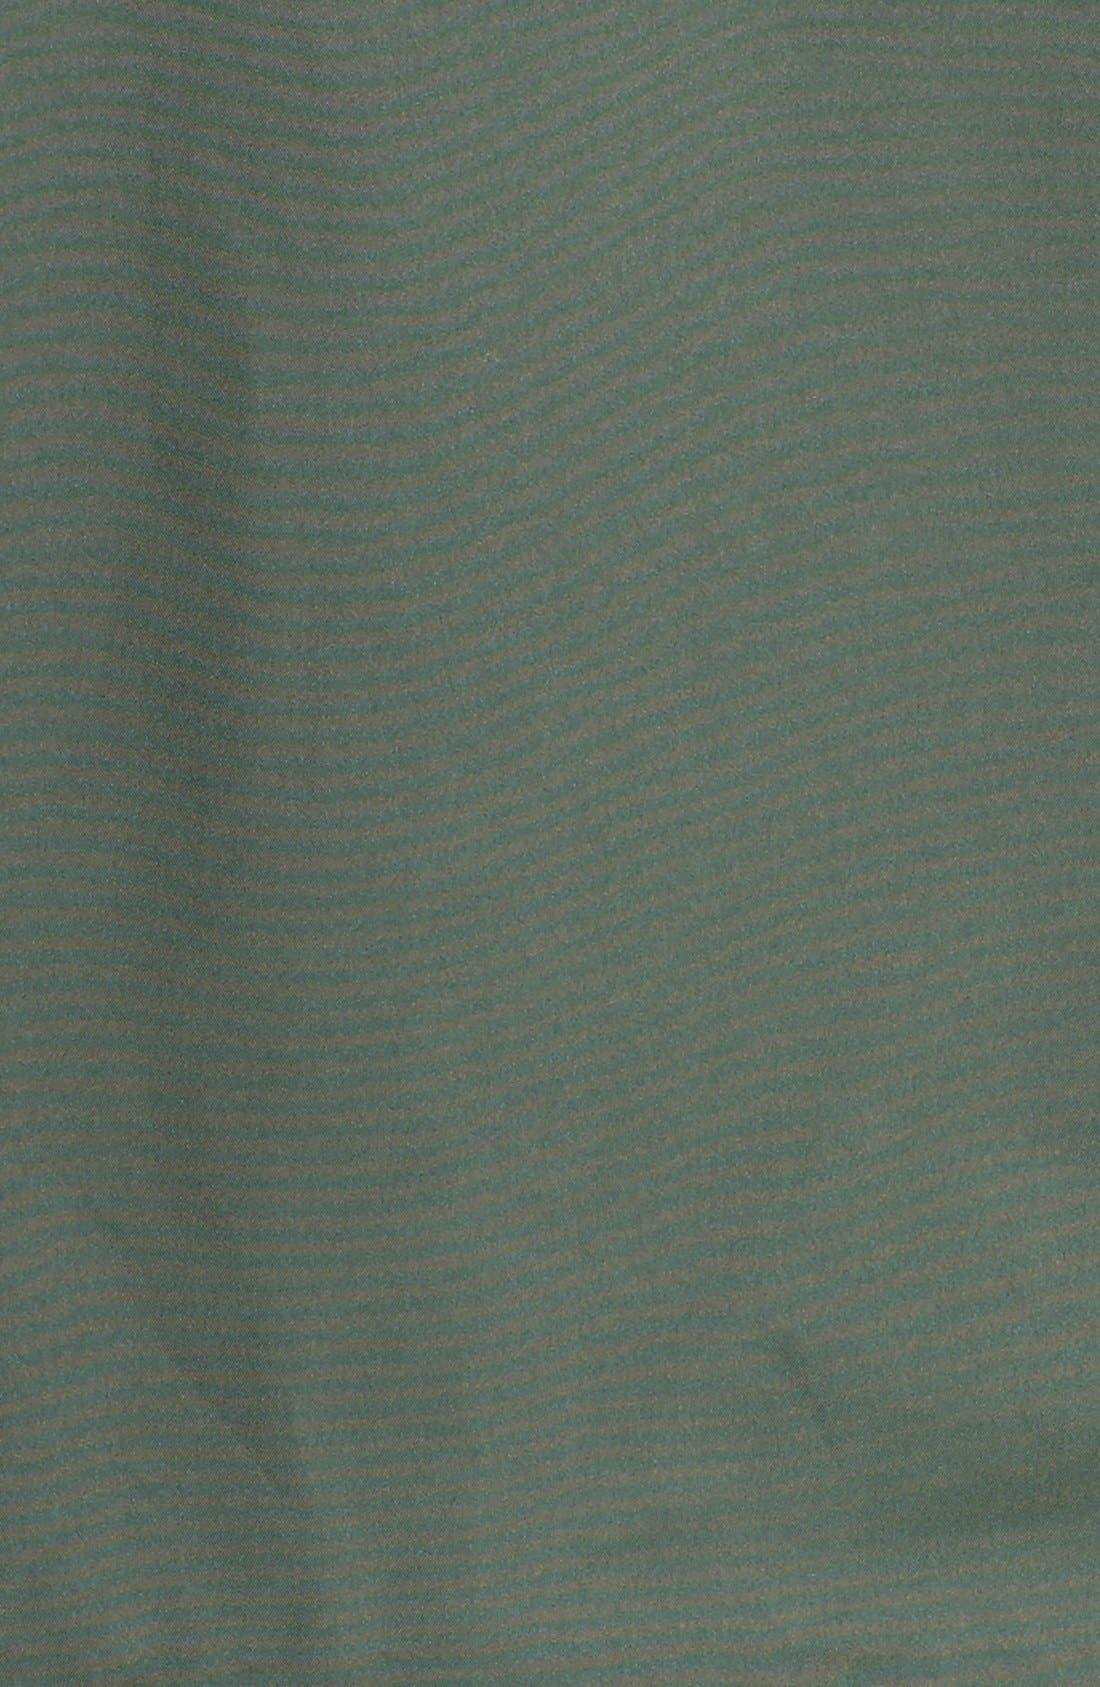 'Appleton' Waterproof Coat,                             Alternate thumbnail 5, color,                             Rock